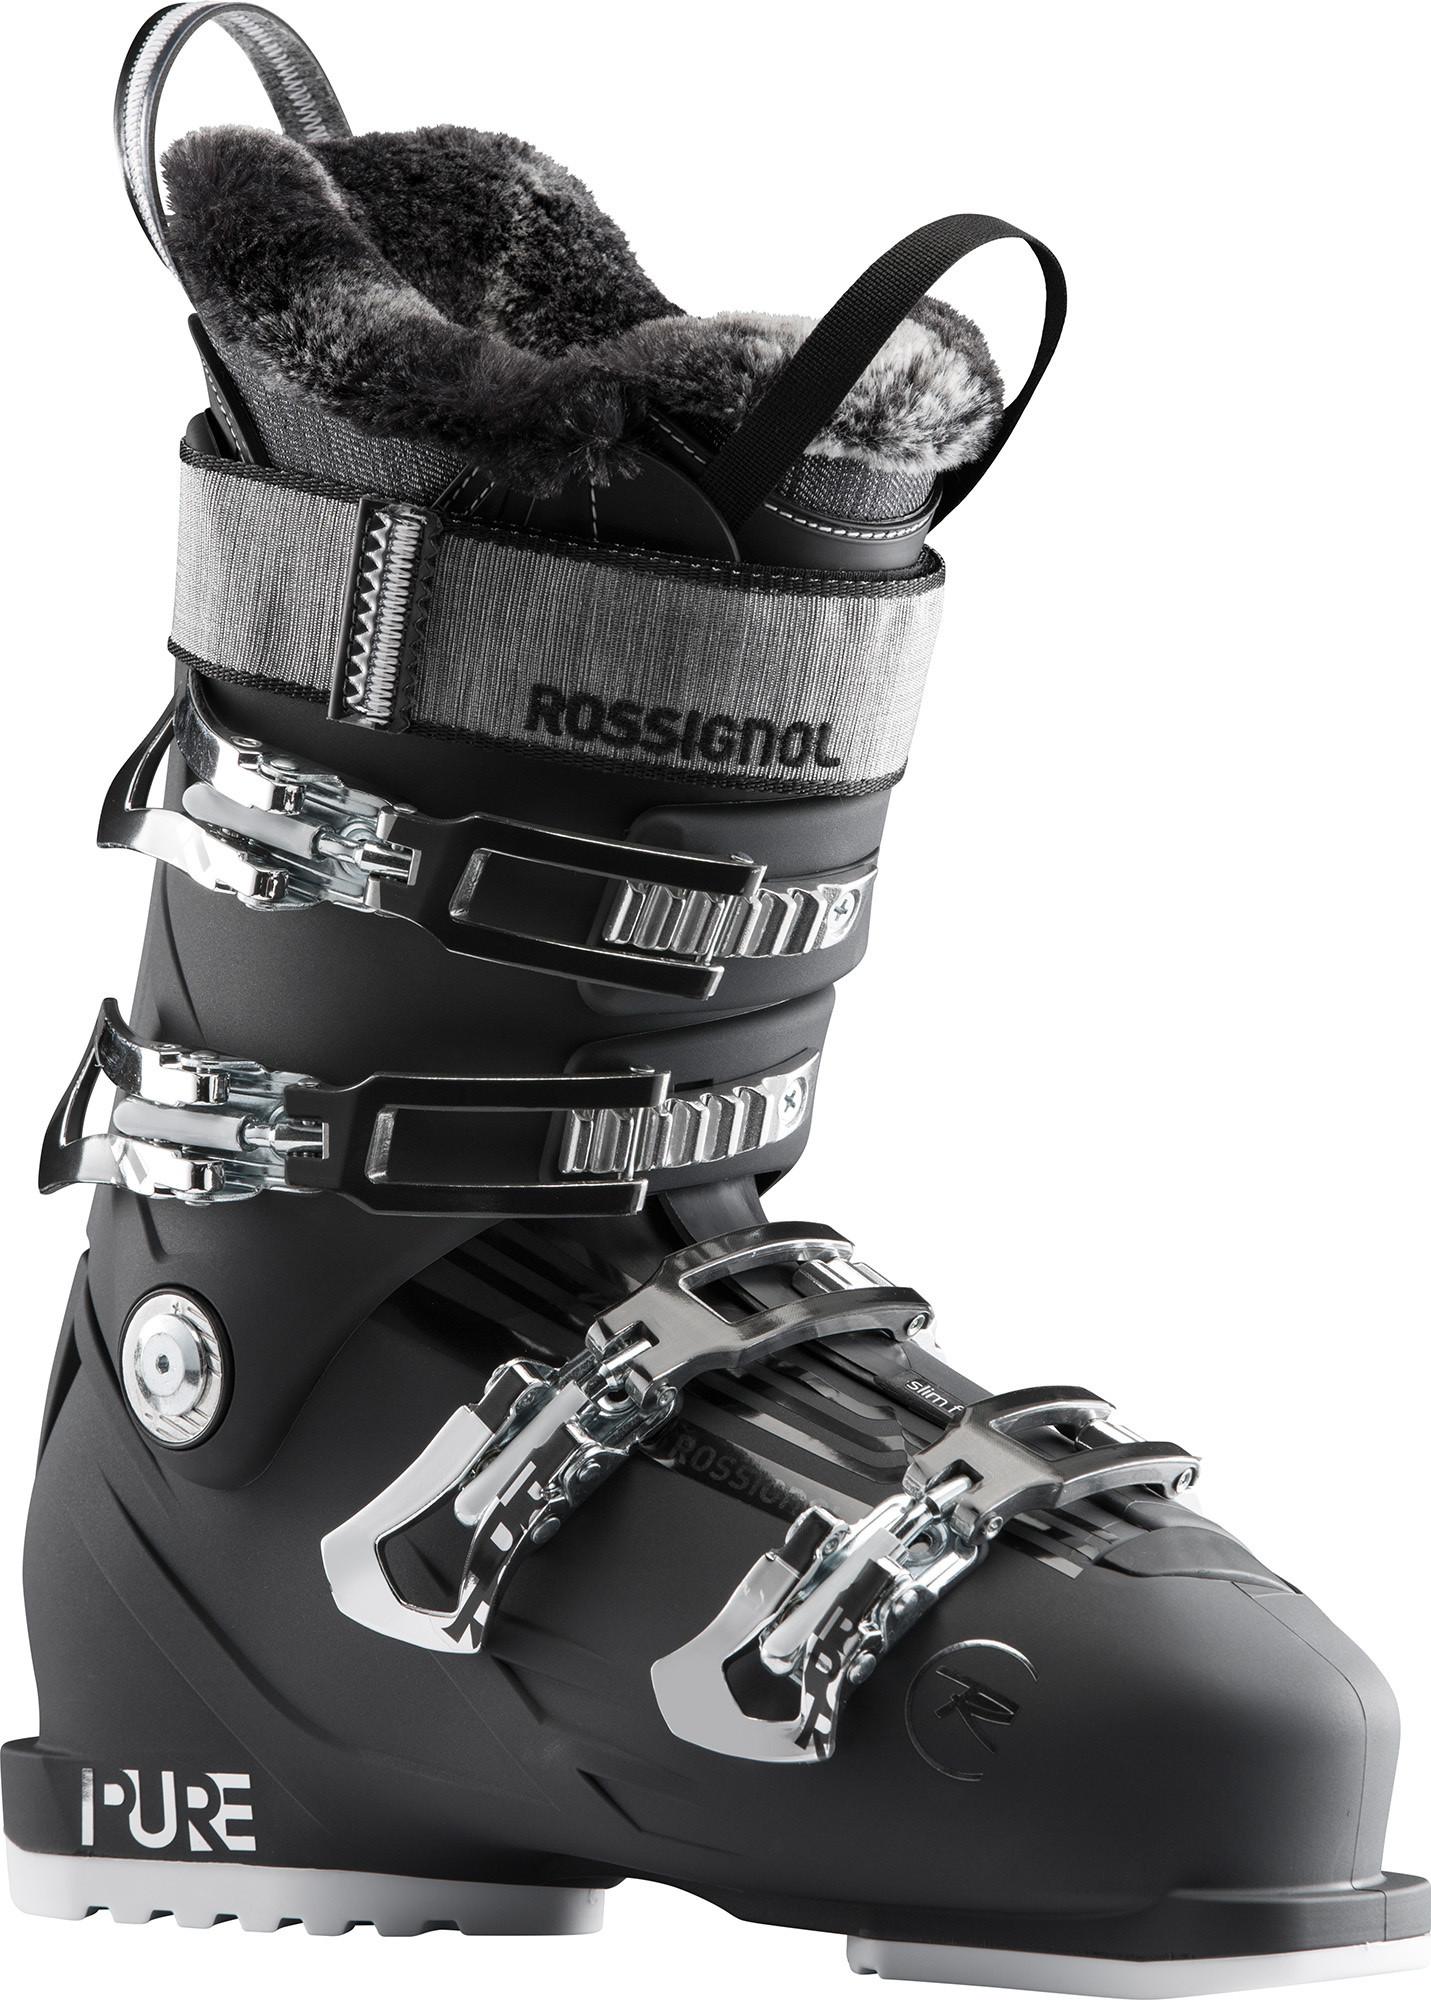 Black Pure Rossignol 80 Pro Chaussure Soft qVpjGMLUzS